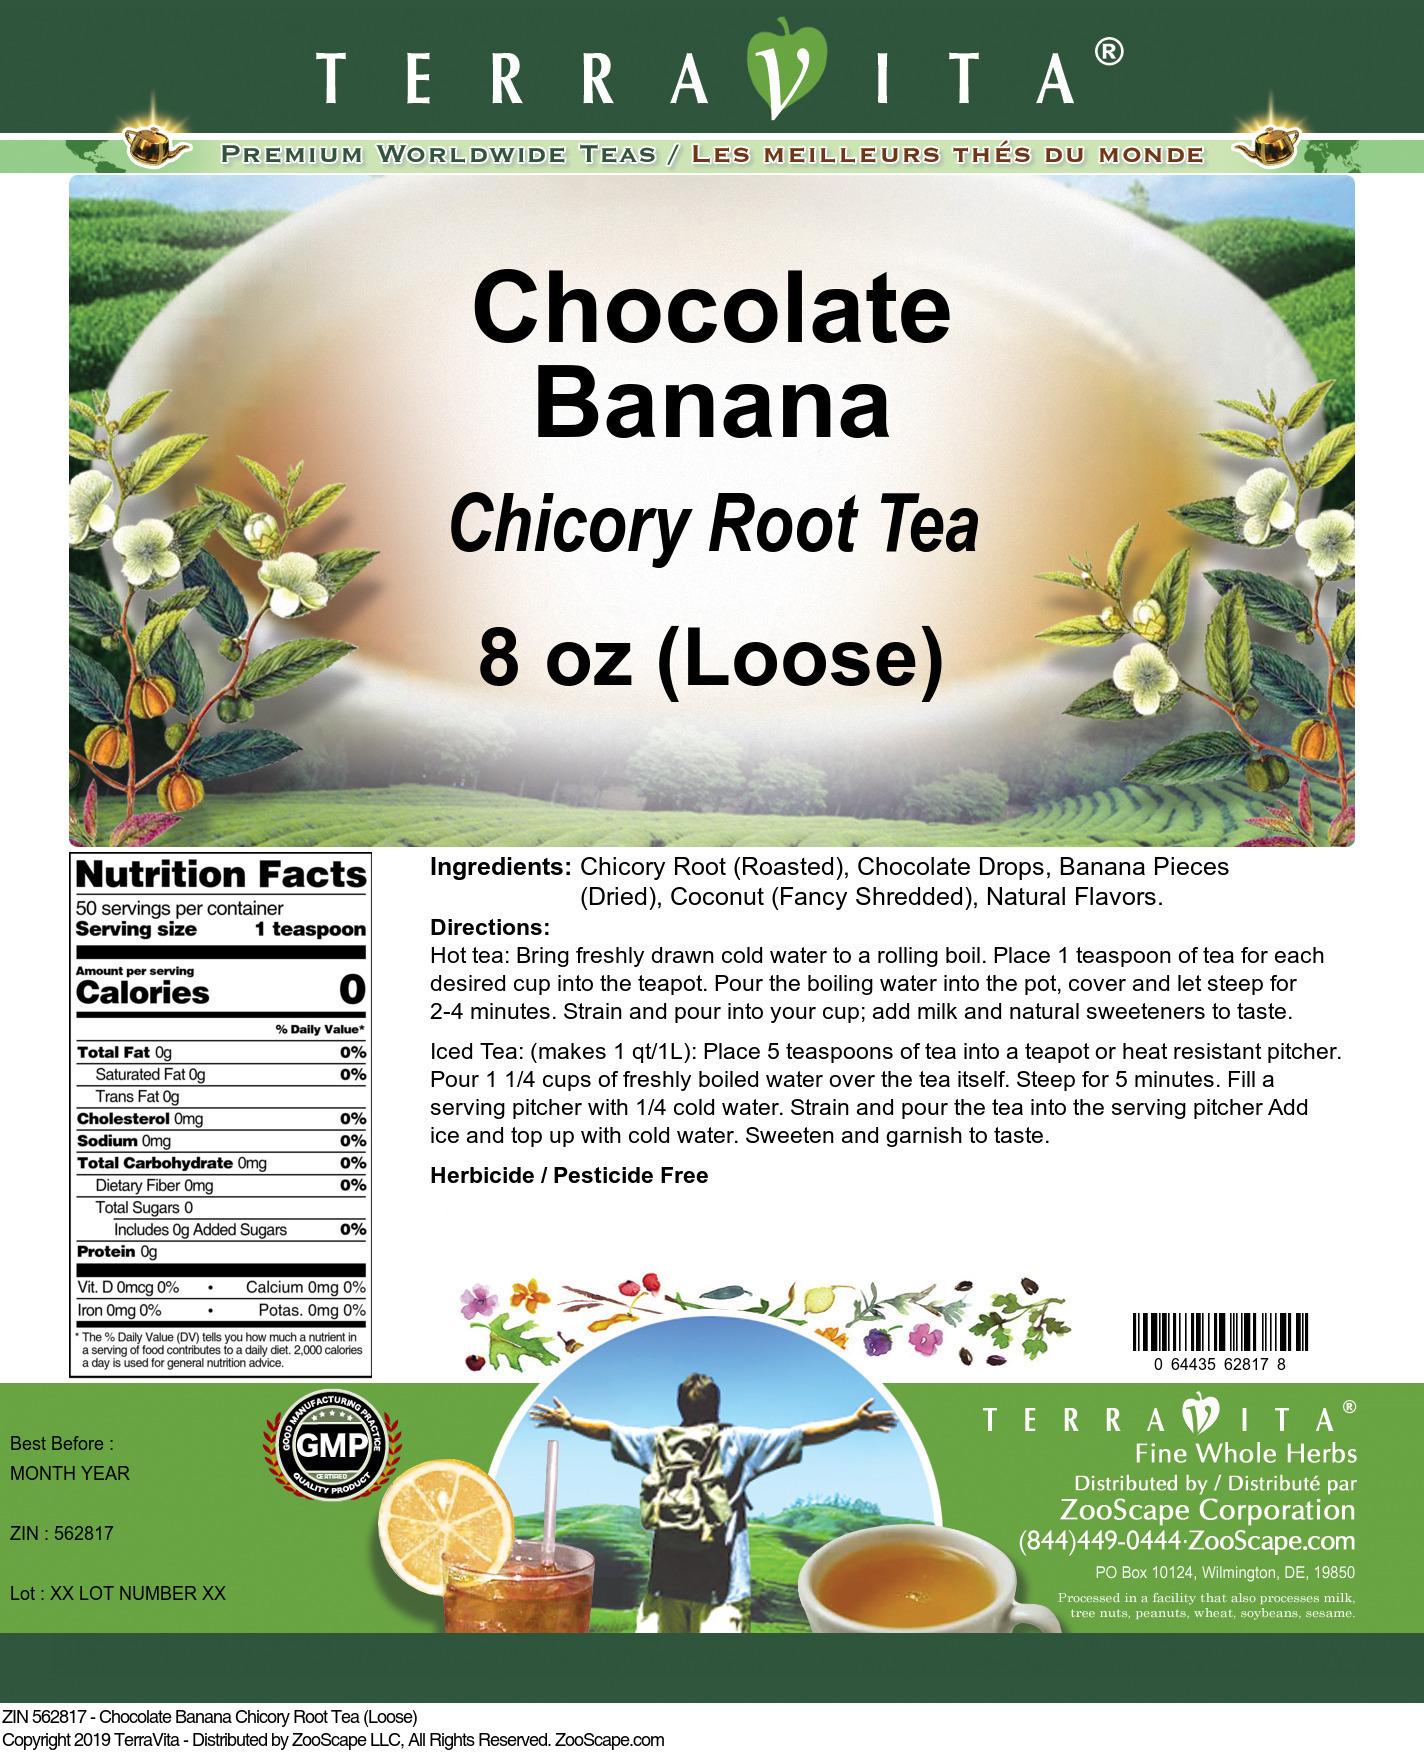 Chocolate Banana Chicory Root Tea (Loose)